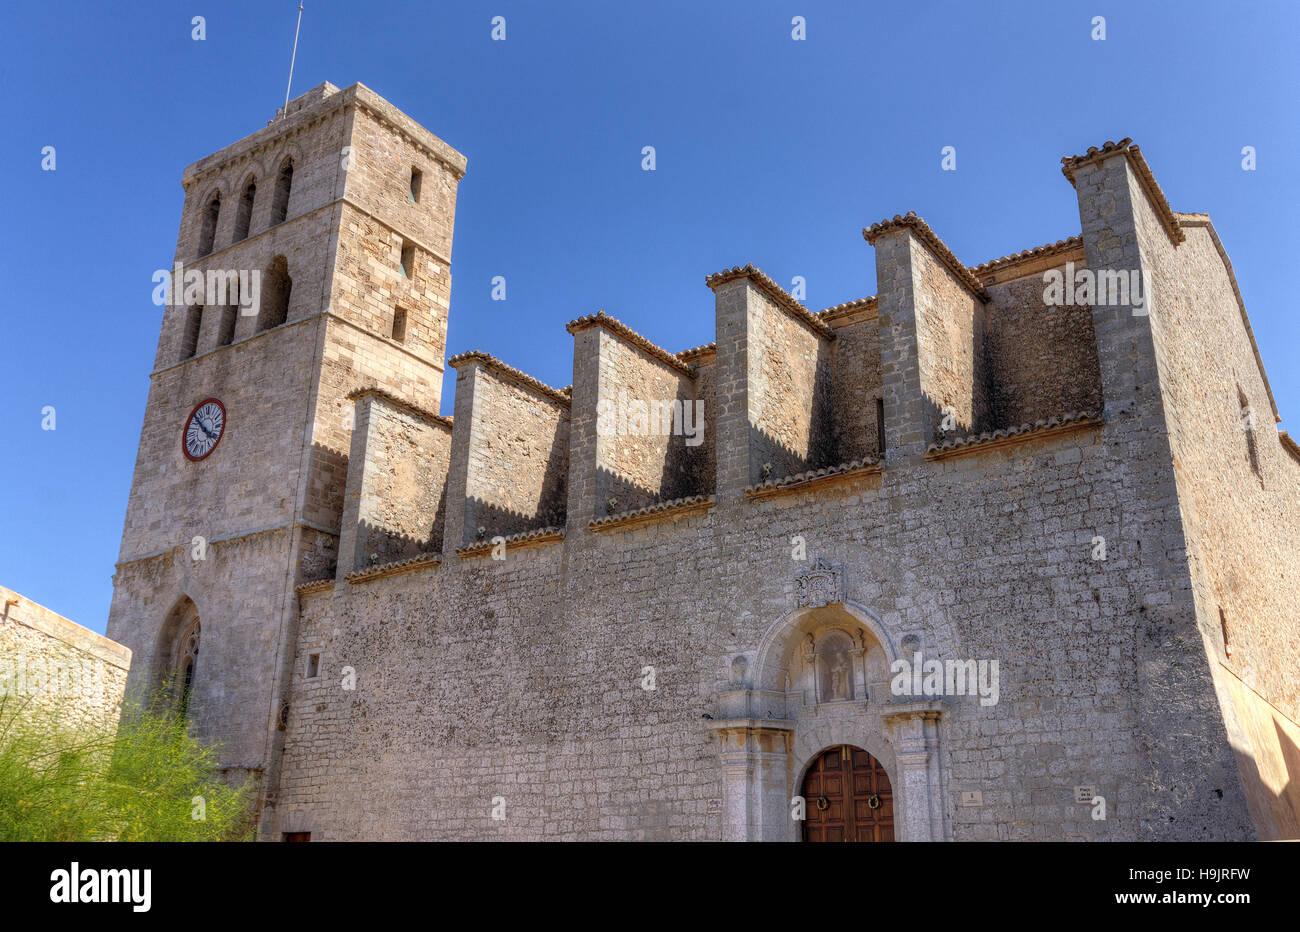 Spain, Balearic Islands, Ibiza, Eivissa, old town Dalt Vila, the cathedral - Stock Image